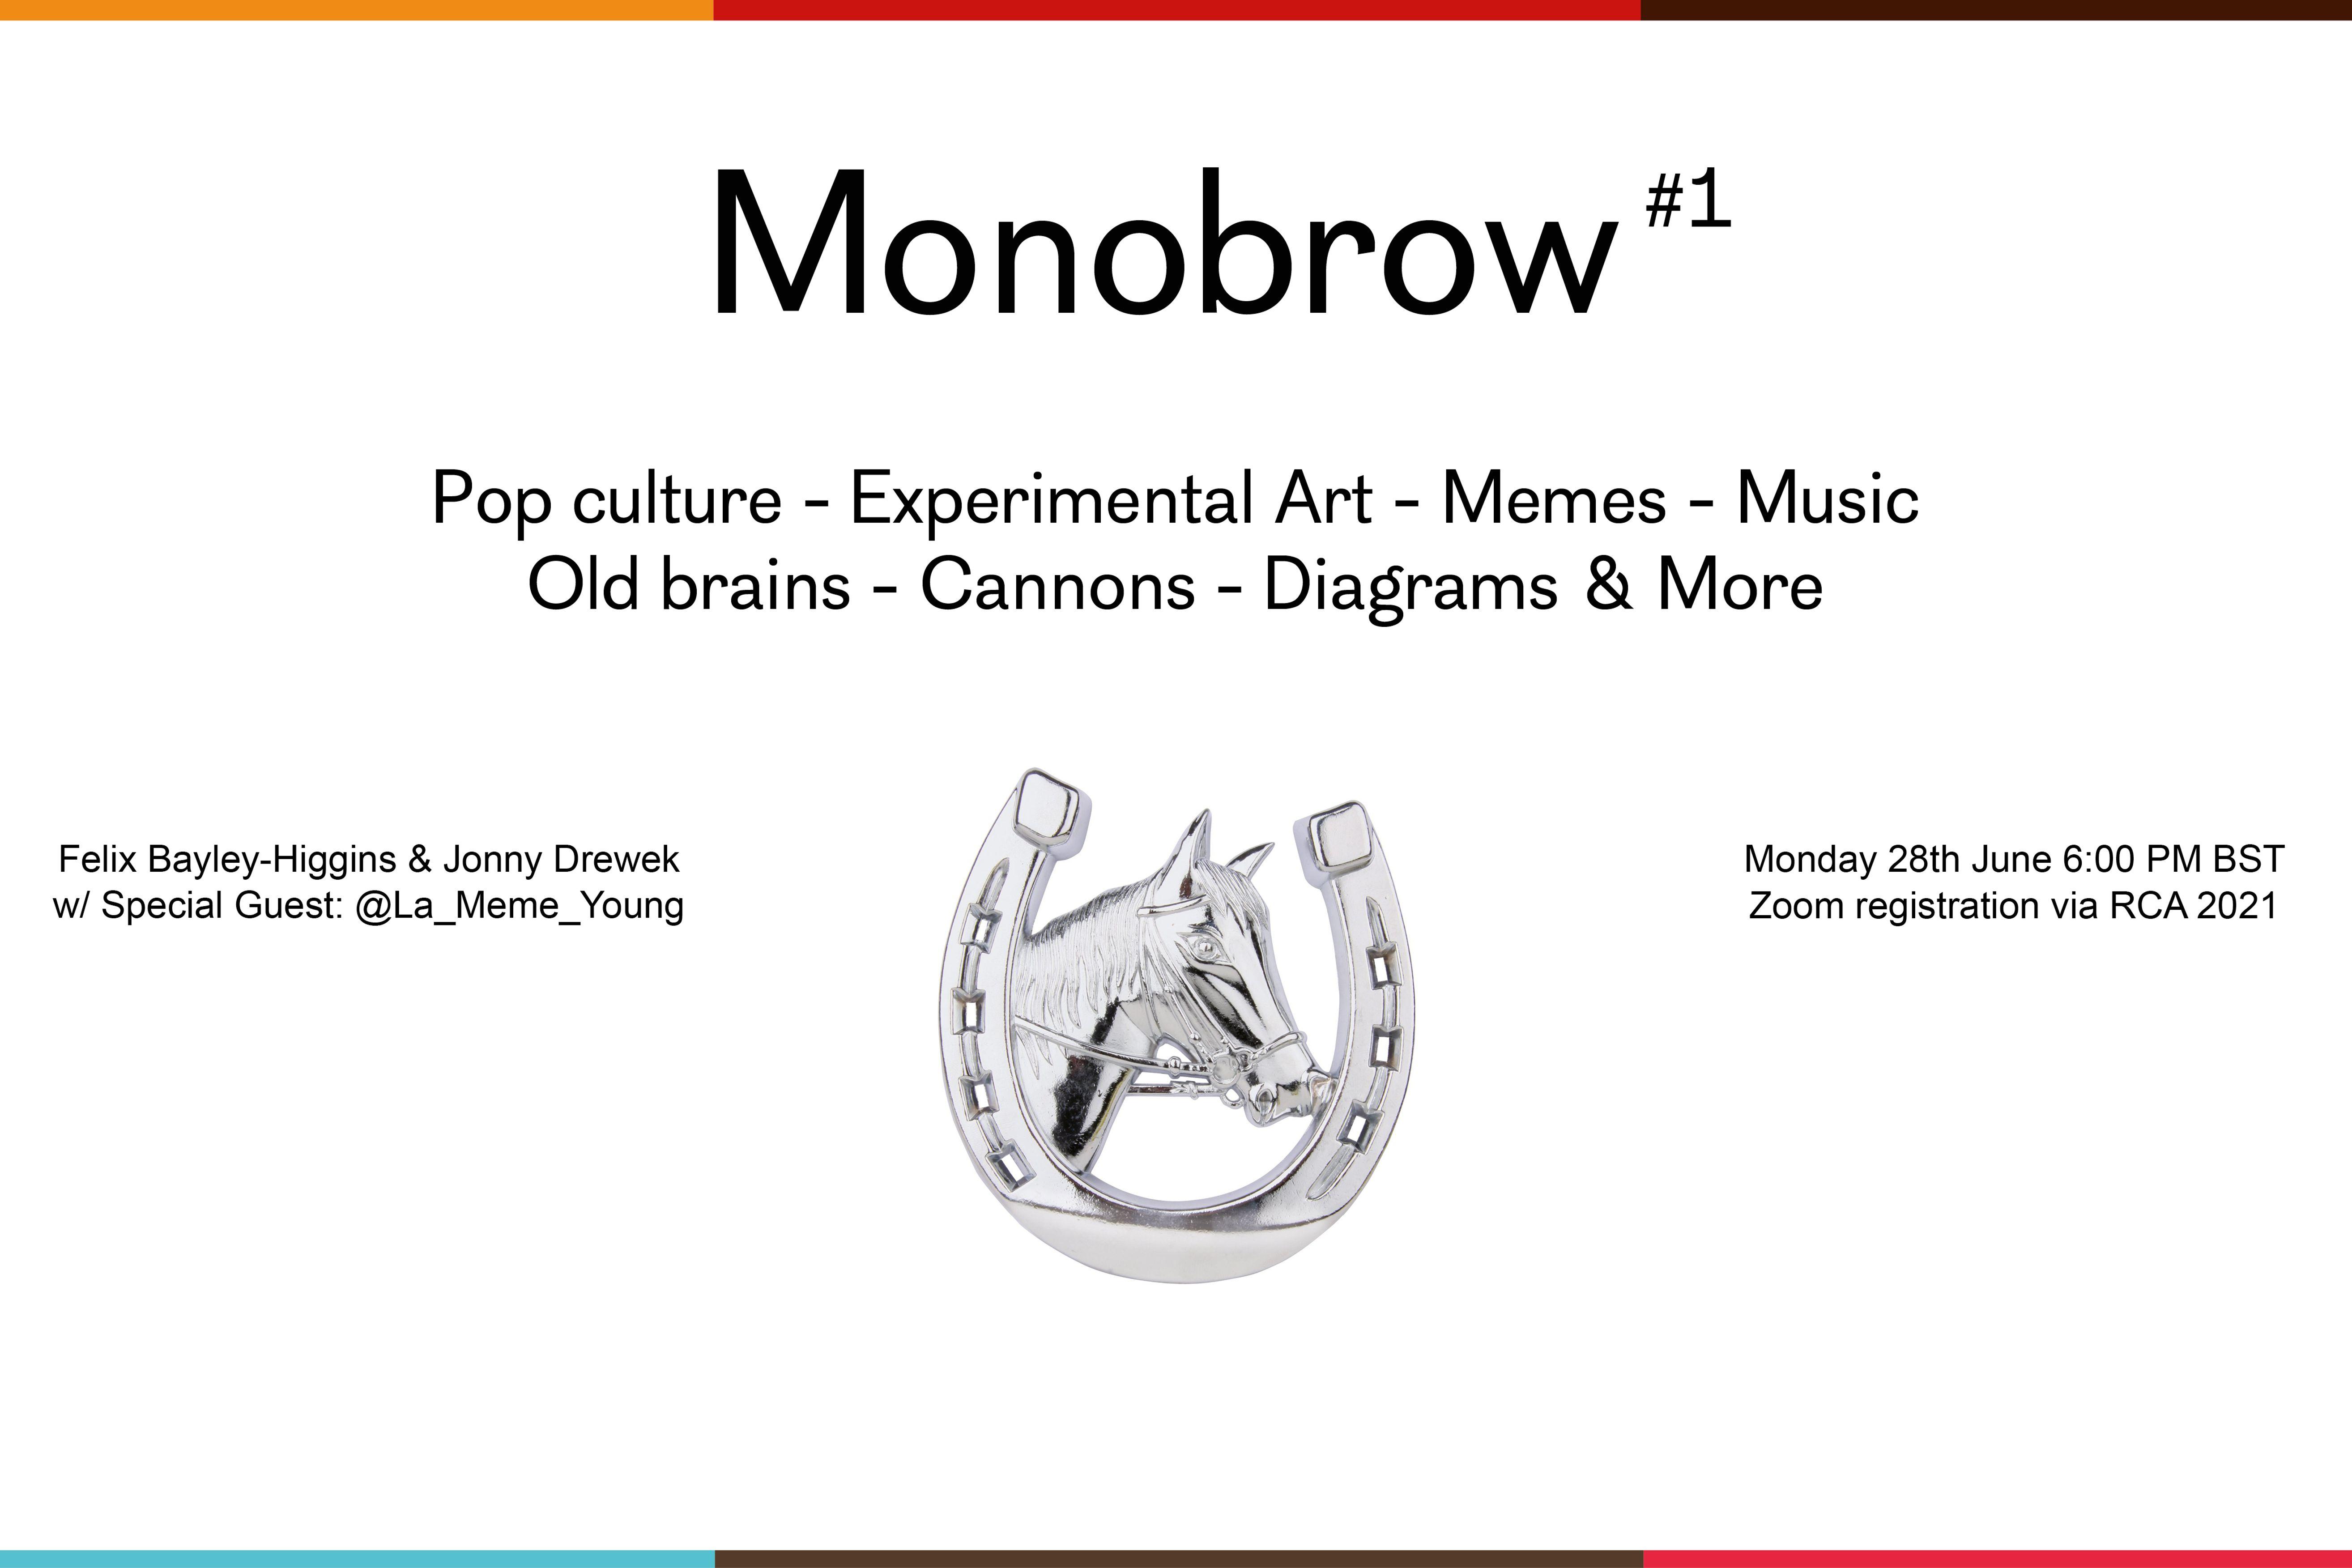 Monobrow cover image